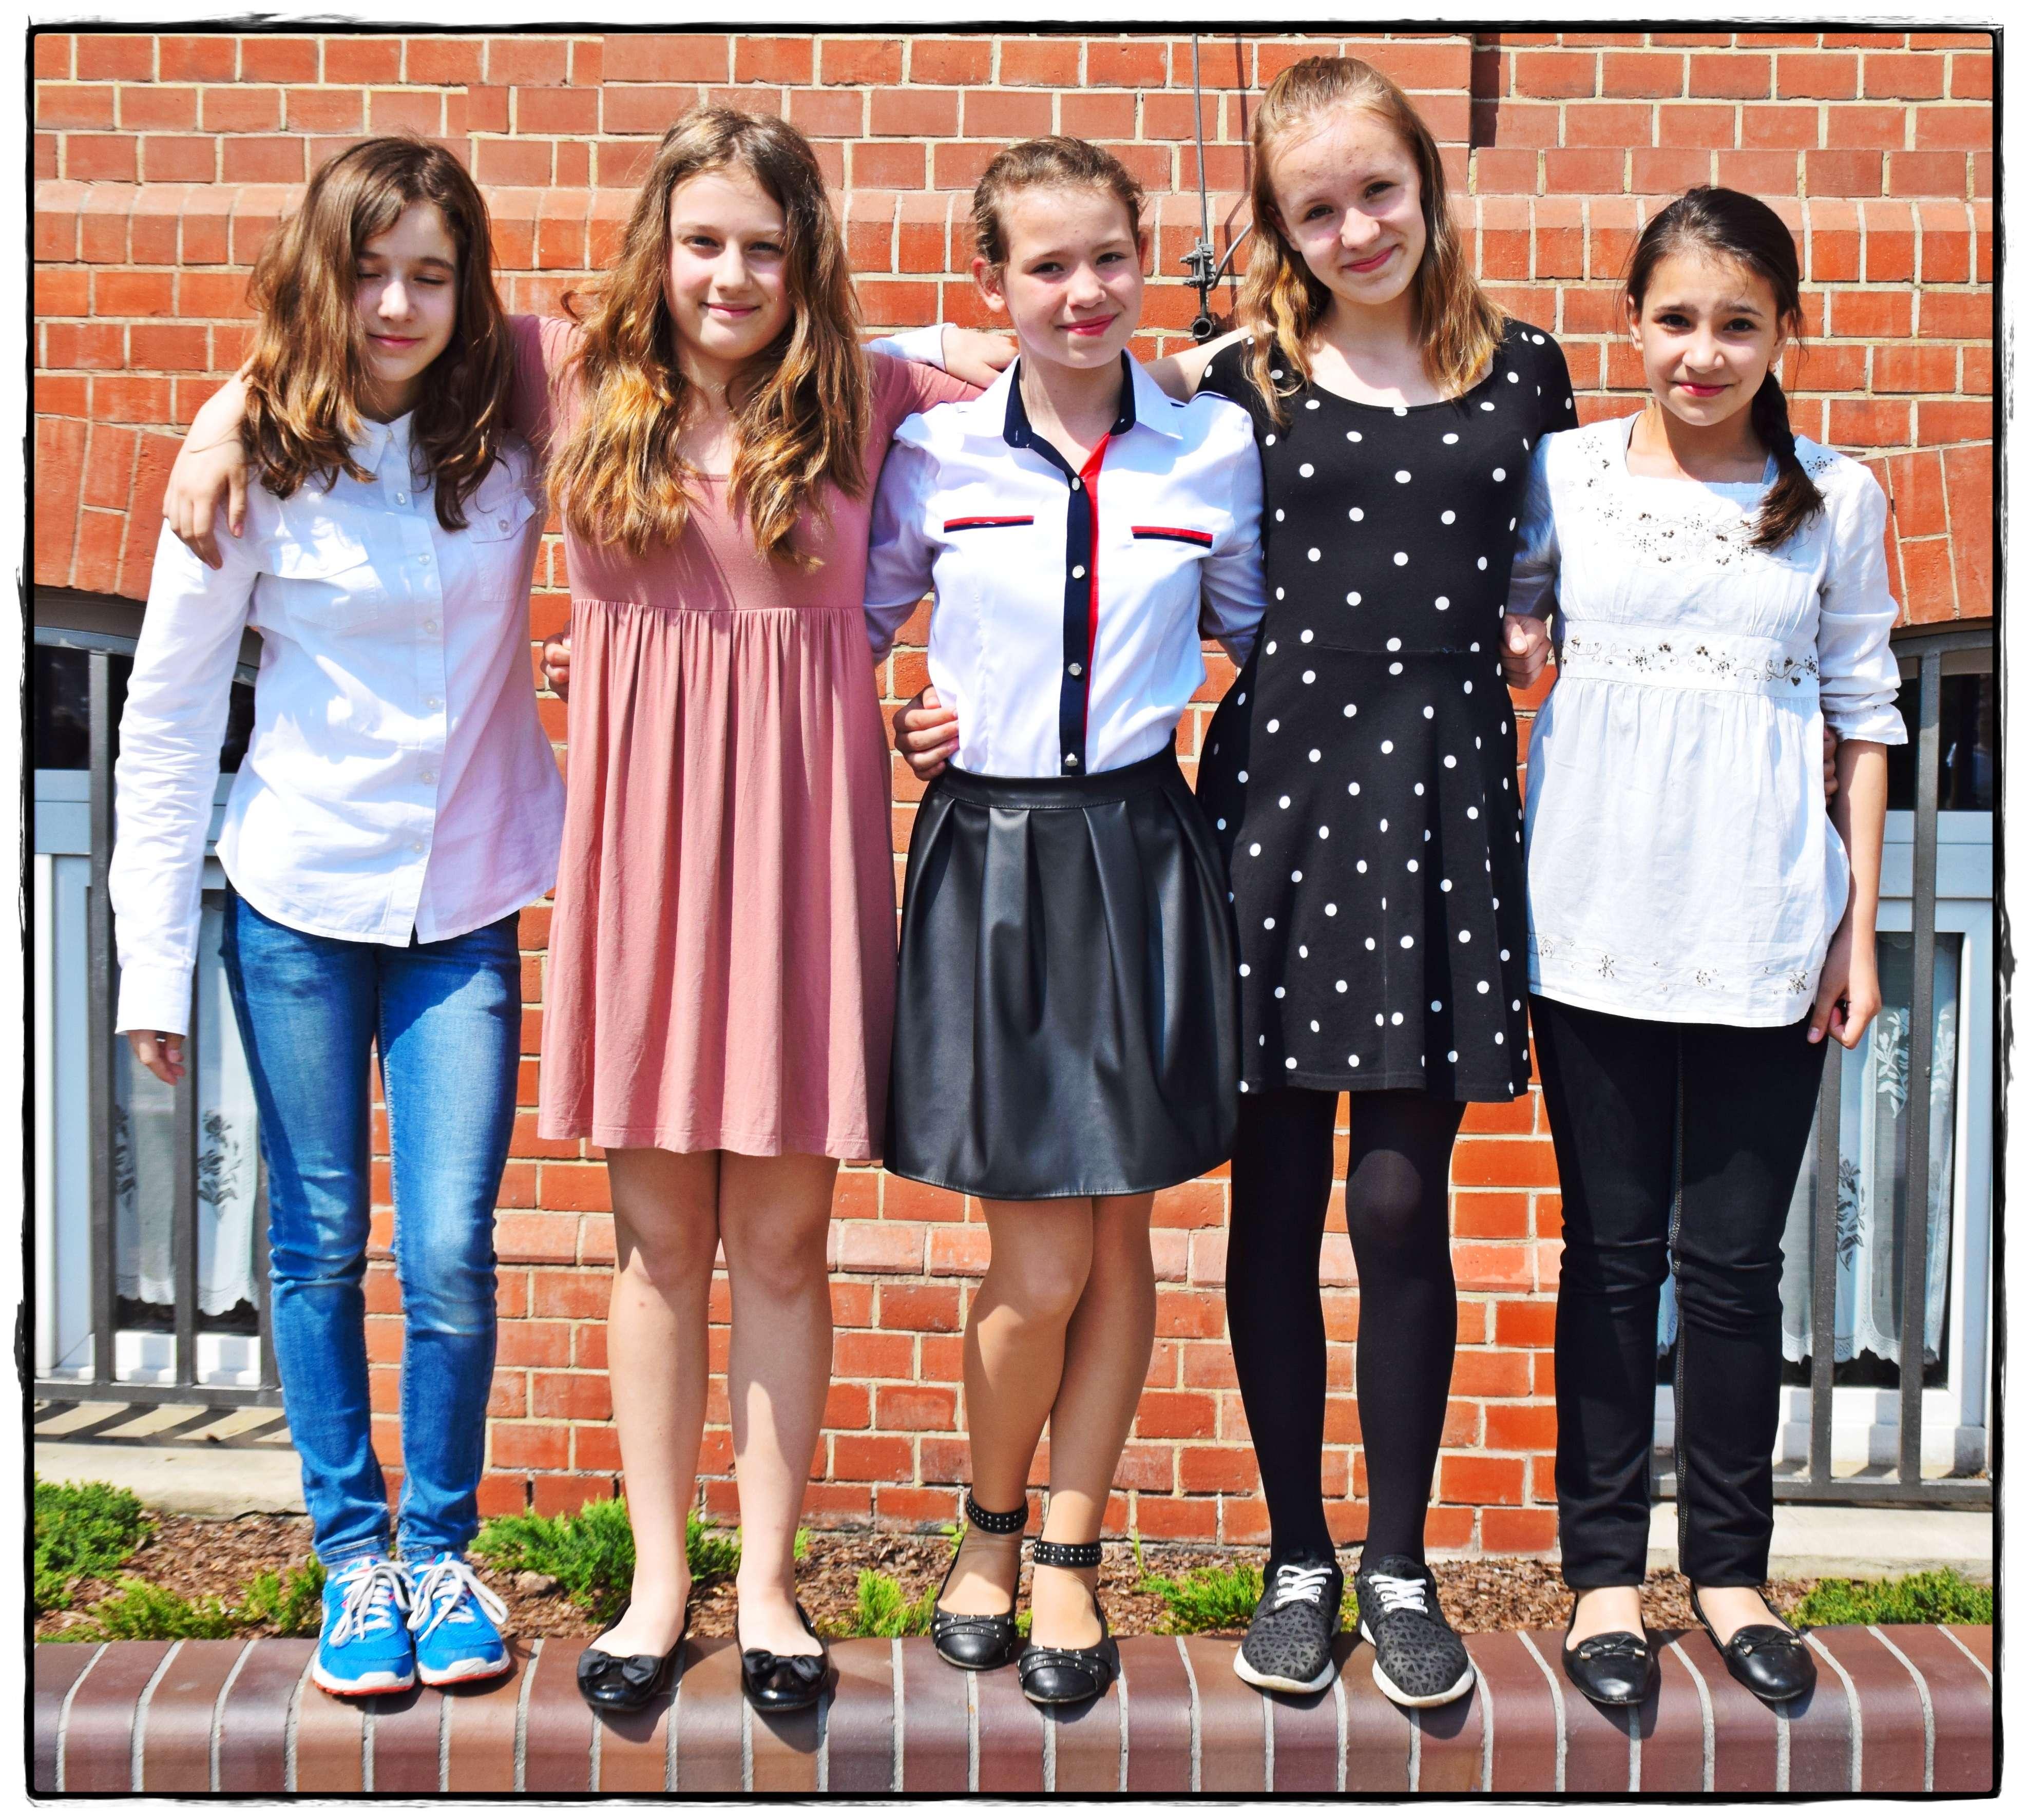 Święto Szkoły 2016